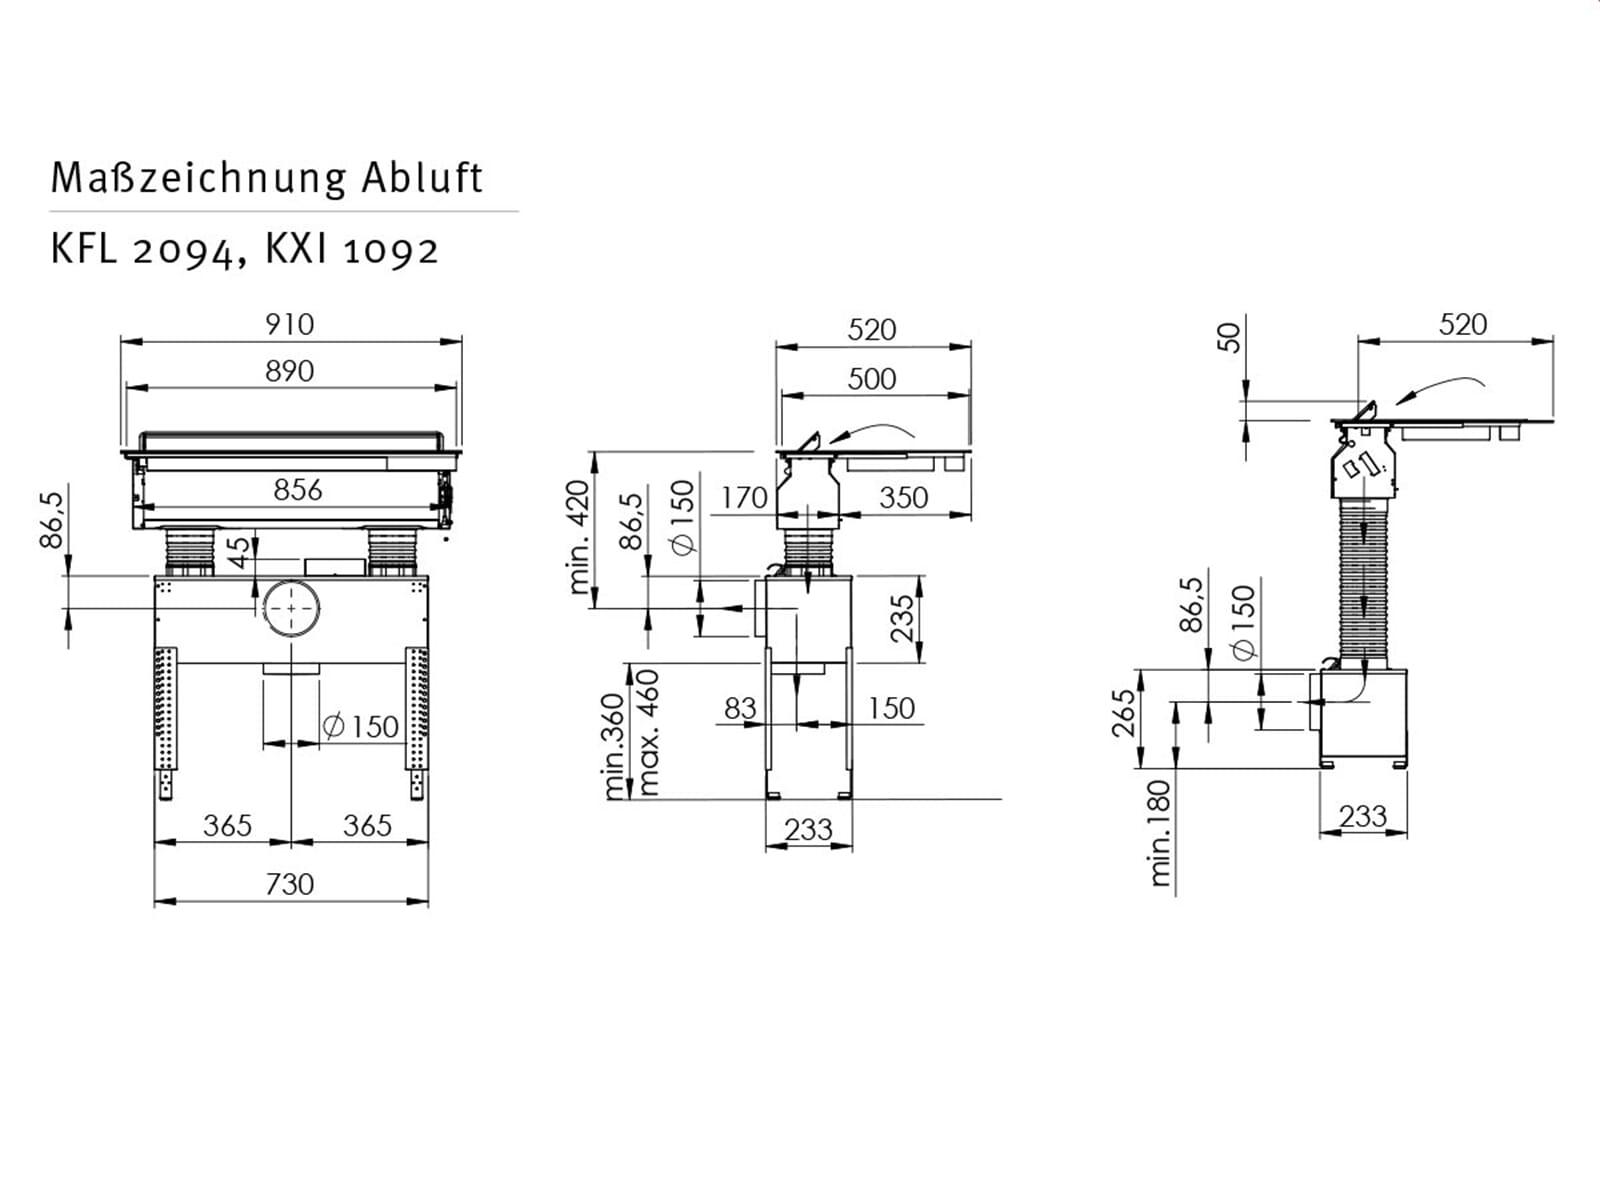 oranier kfl 2094 209455 induktionskochfeld dunstabzug kombi kochfeldabzug ebay. Black Bedroom Furniture Sets. Home Design Ideas